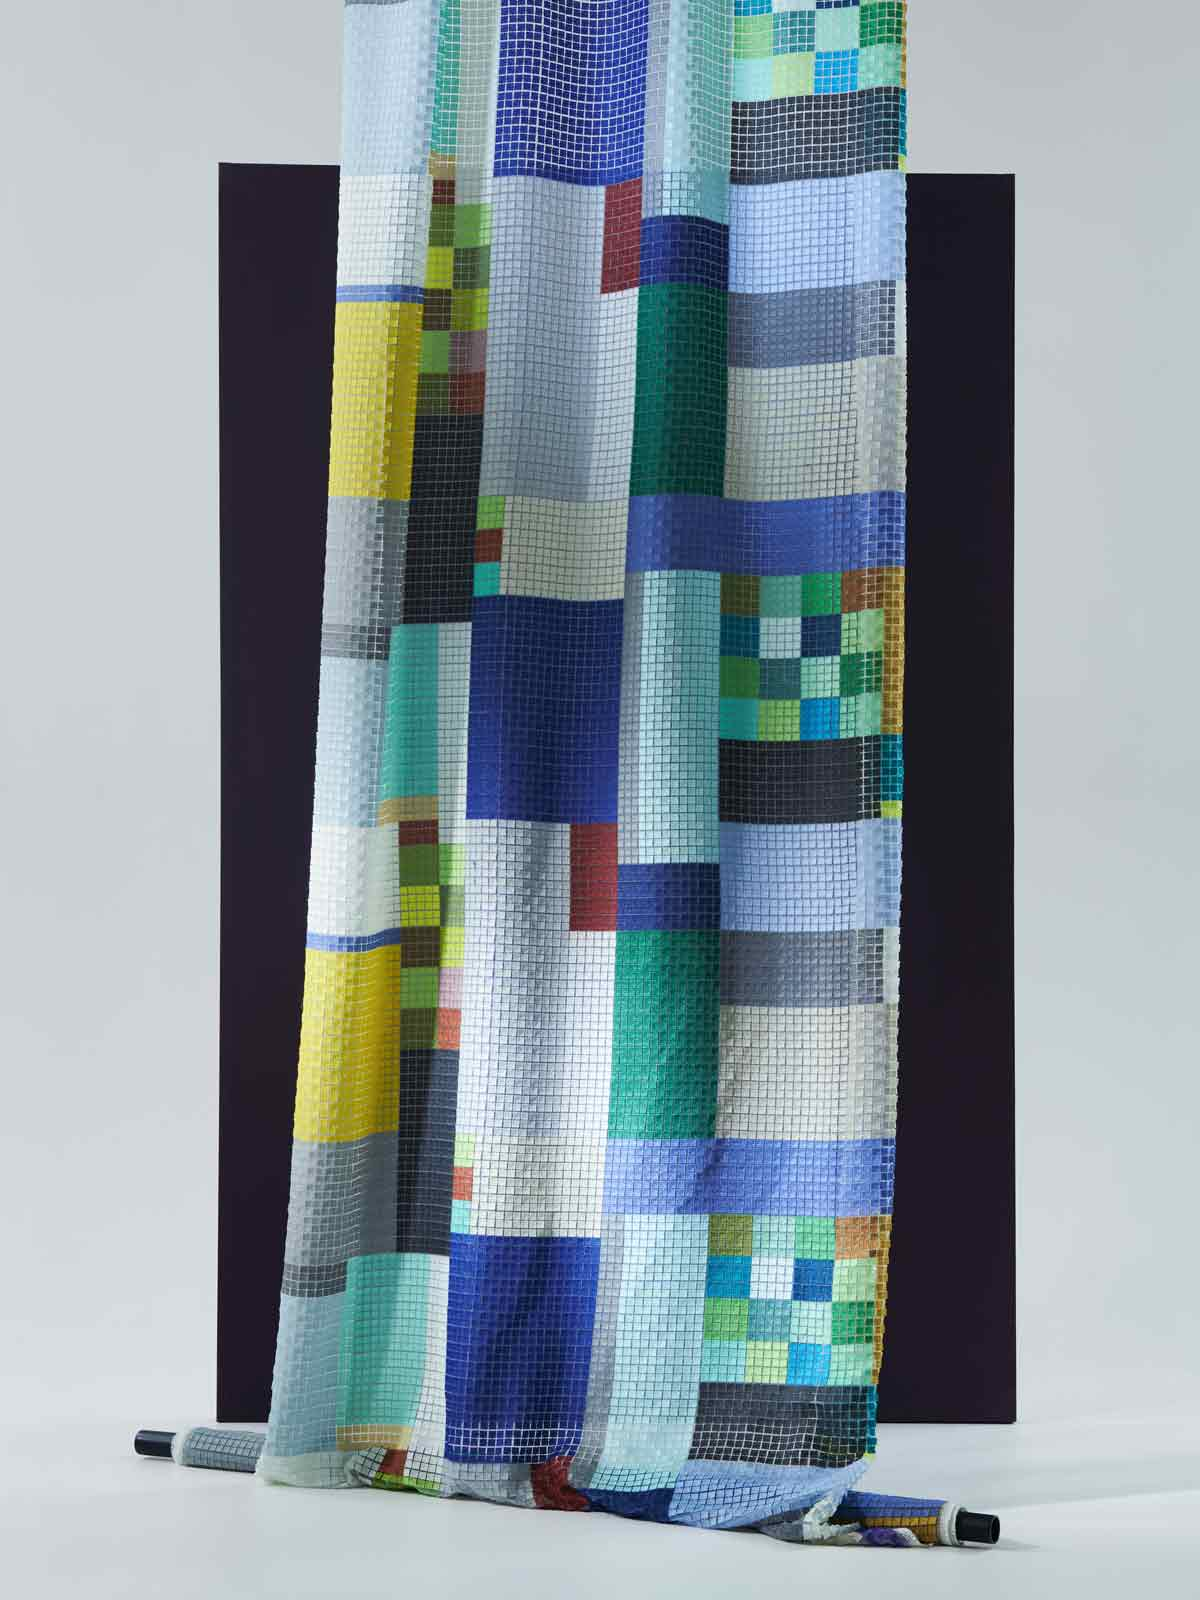 bernhard duss-jakob schlaepfer-curtains-decoration-wallcoverings-textiledesign-tapeten-designer-custom made wallcovering-inkjetprint-interiorfabrics-interior collection-embroidery